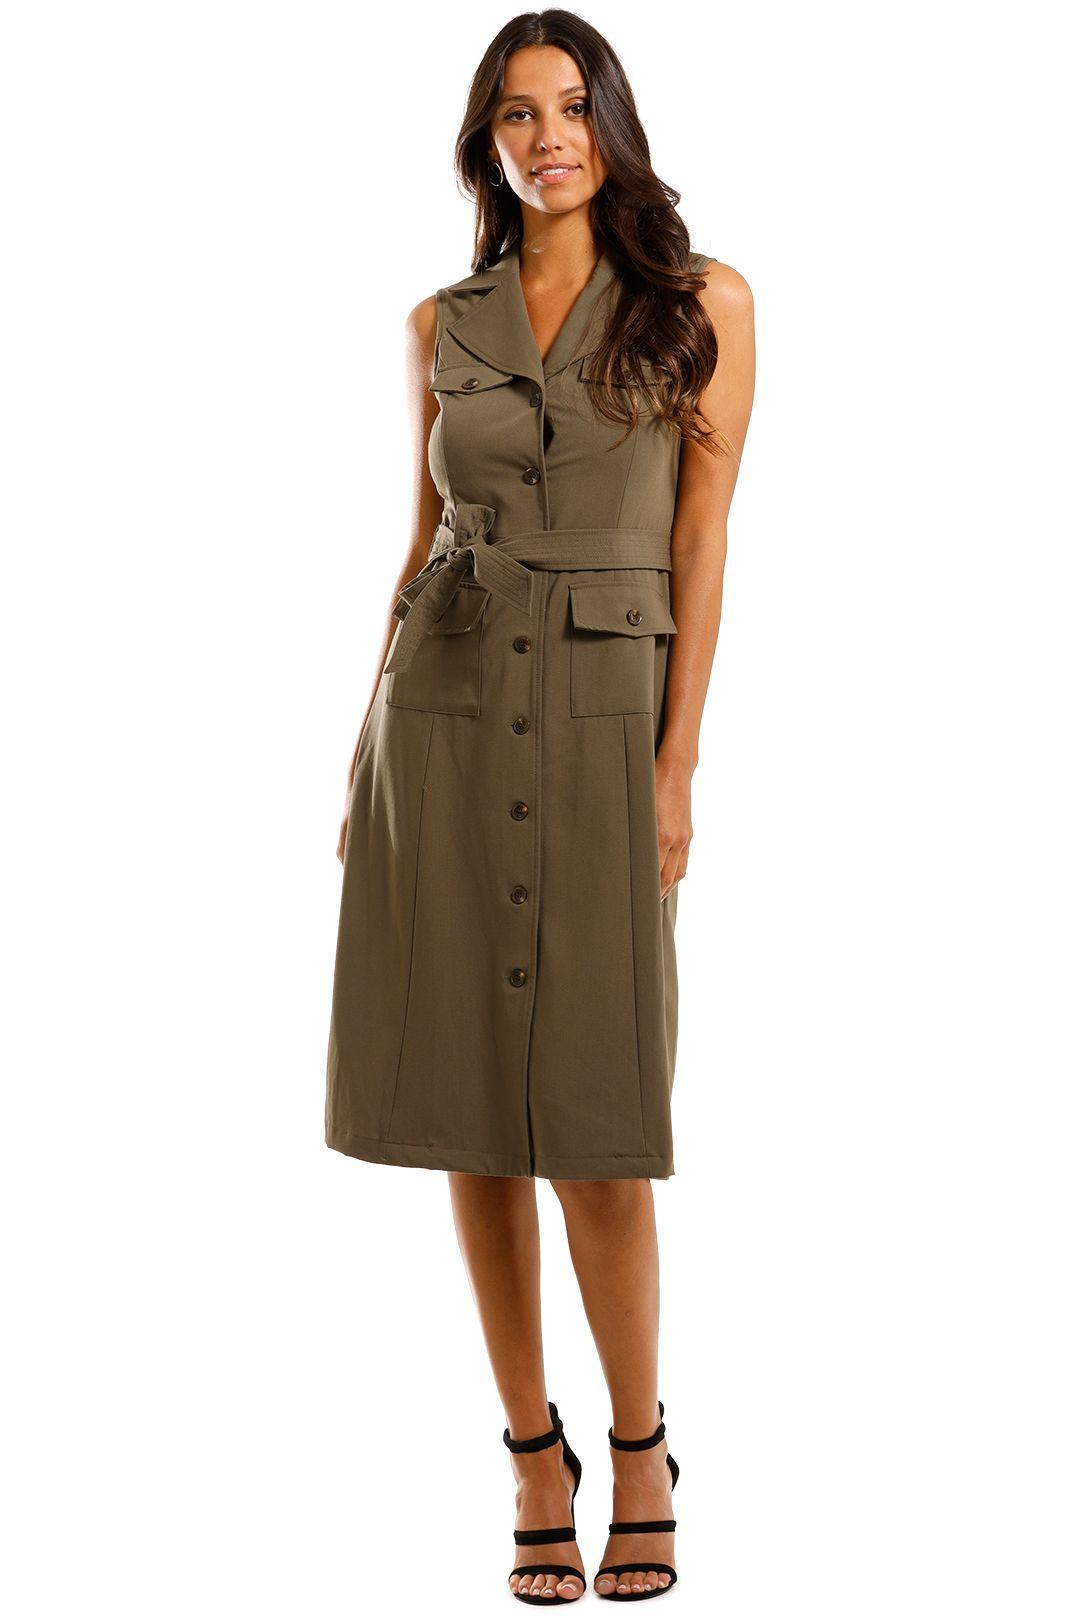 Calvin Klein Sleeveless Button Front Shirt Dress in Khaki